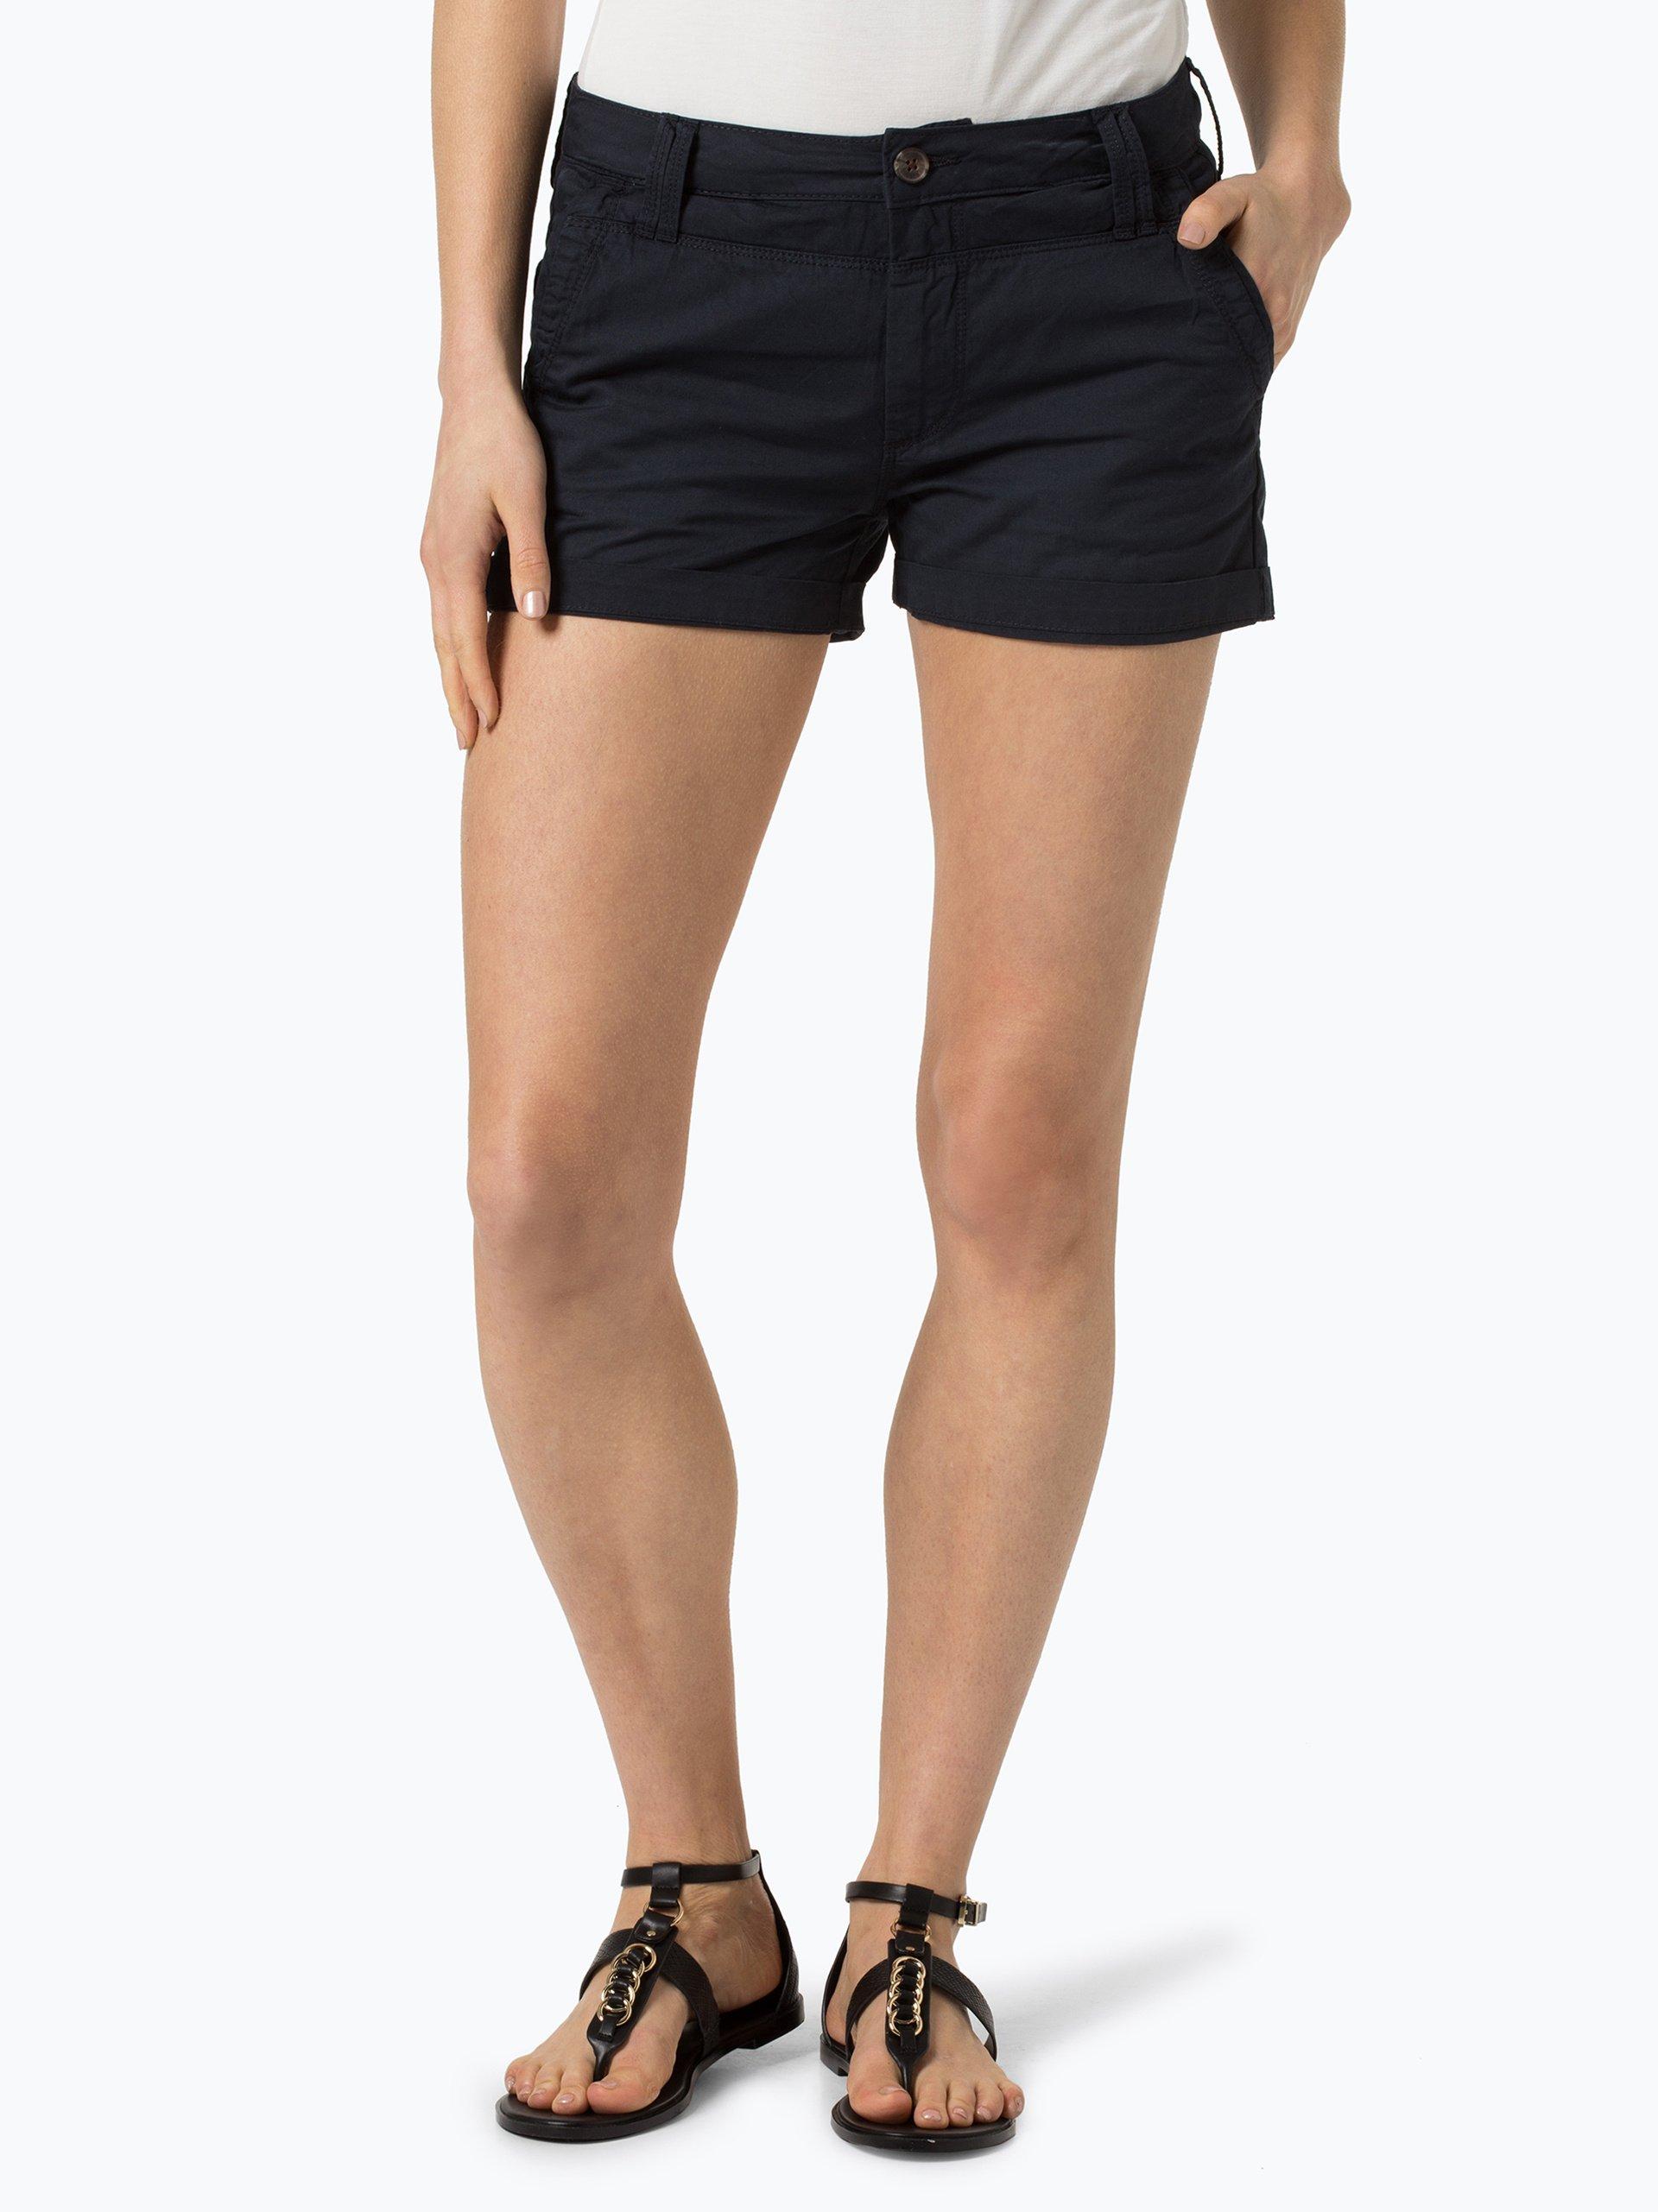 pepe jeans damen shorts balboa marine uni online kaufen. Black Bedroom Furniture Sets. Home Design Ideas